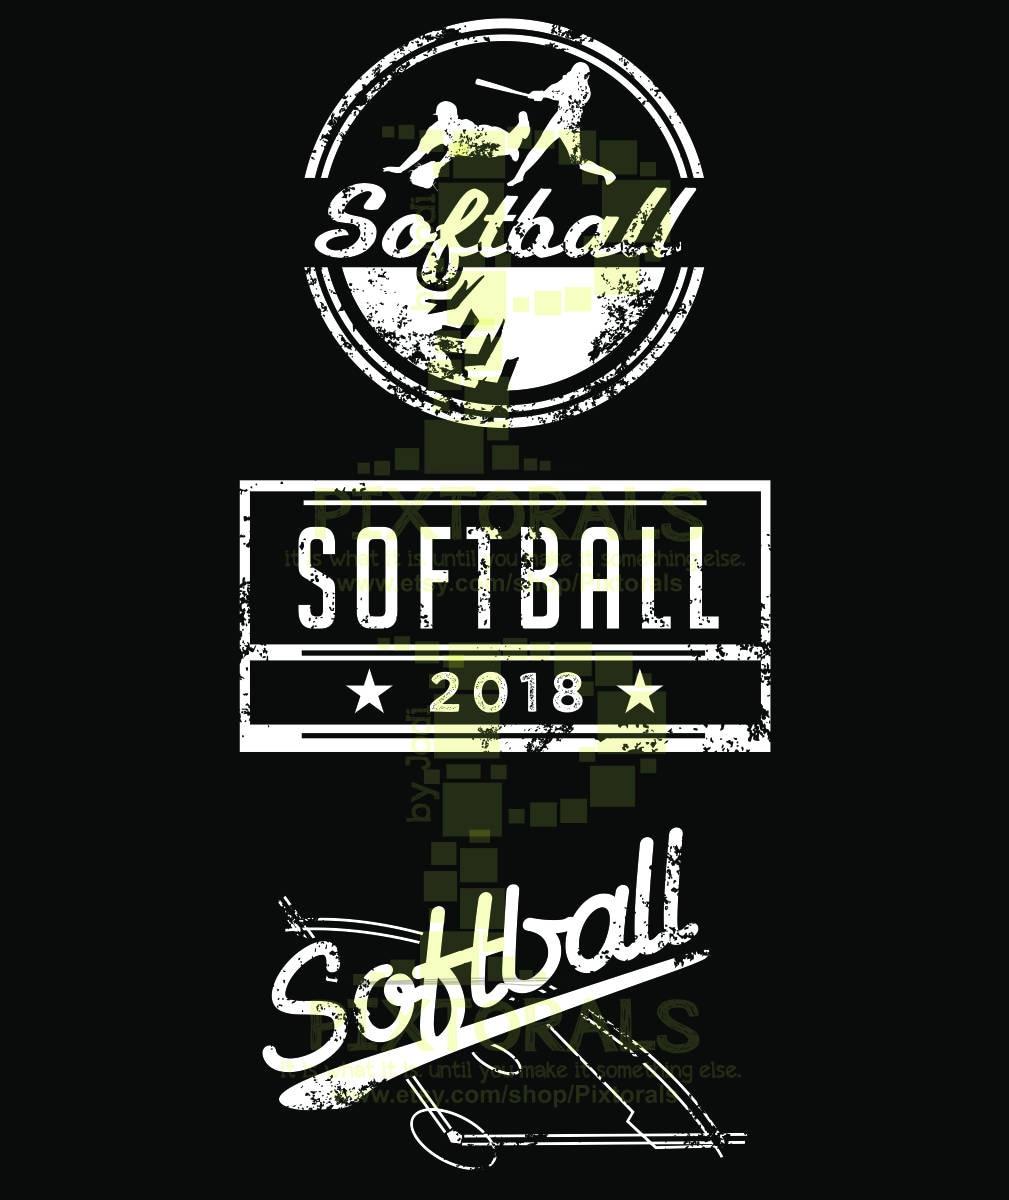 Softball Shirt Design | 3 Vintage Softball Designs Eps Jpeg Png And Pdf New Etsy